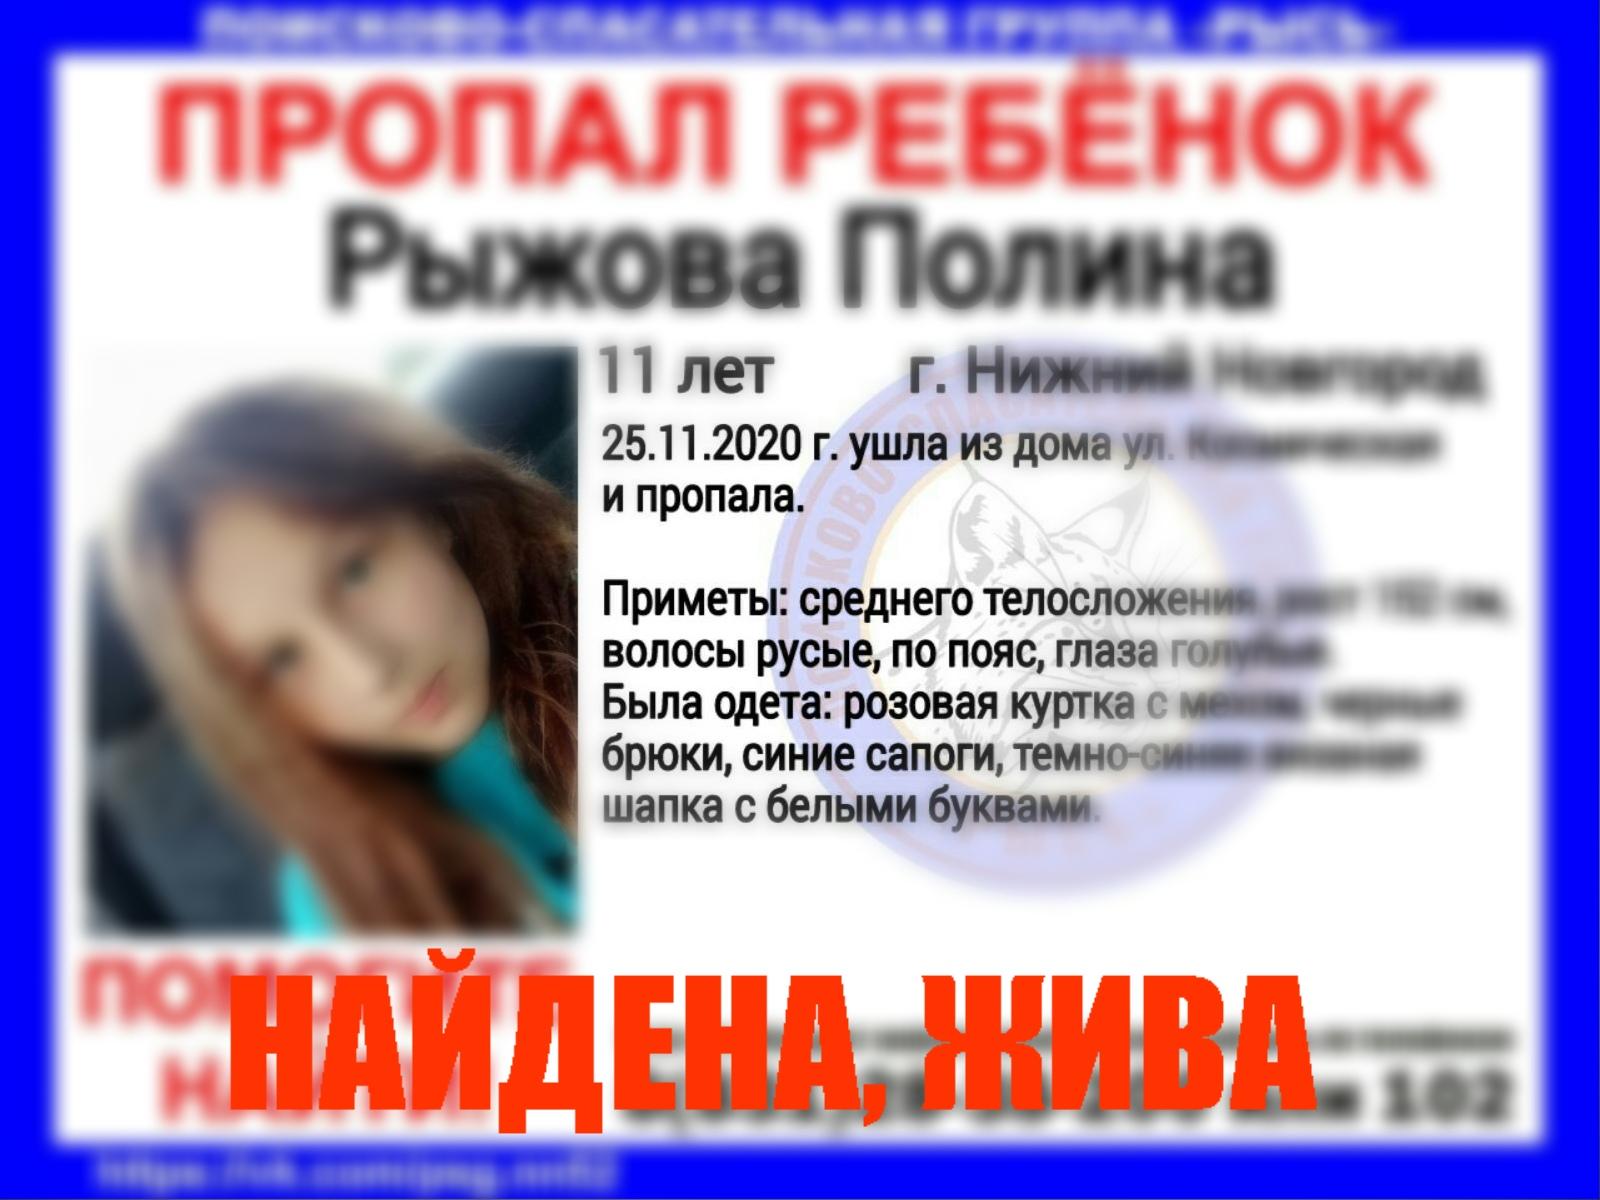 Рыжова Полина